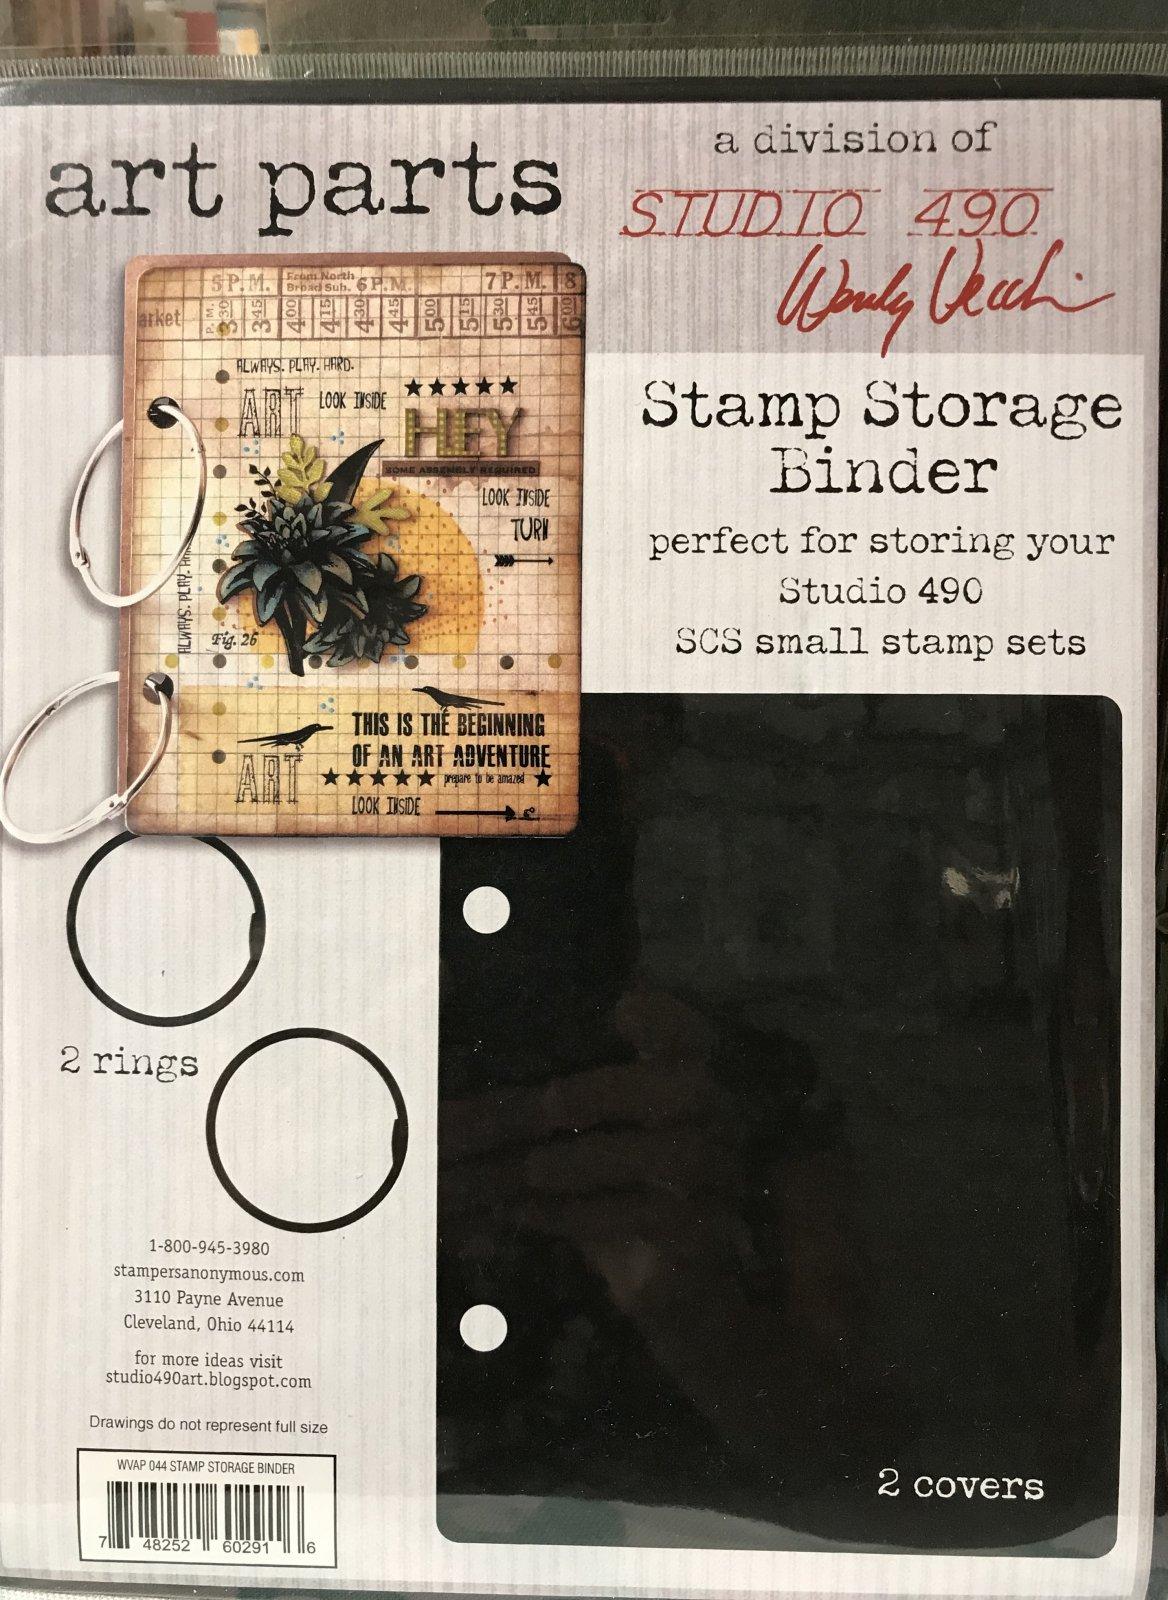 Studio 490 Art Parts Stamp Storage Binder 2 covers, 2 rings